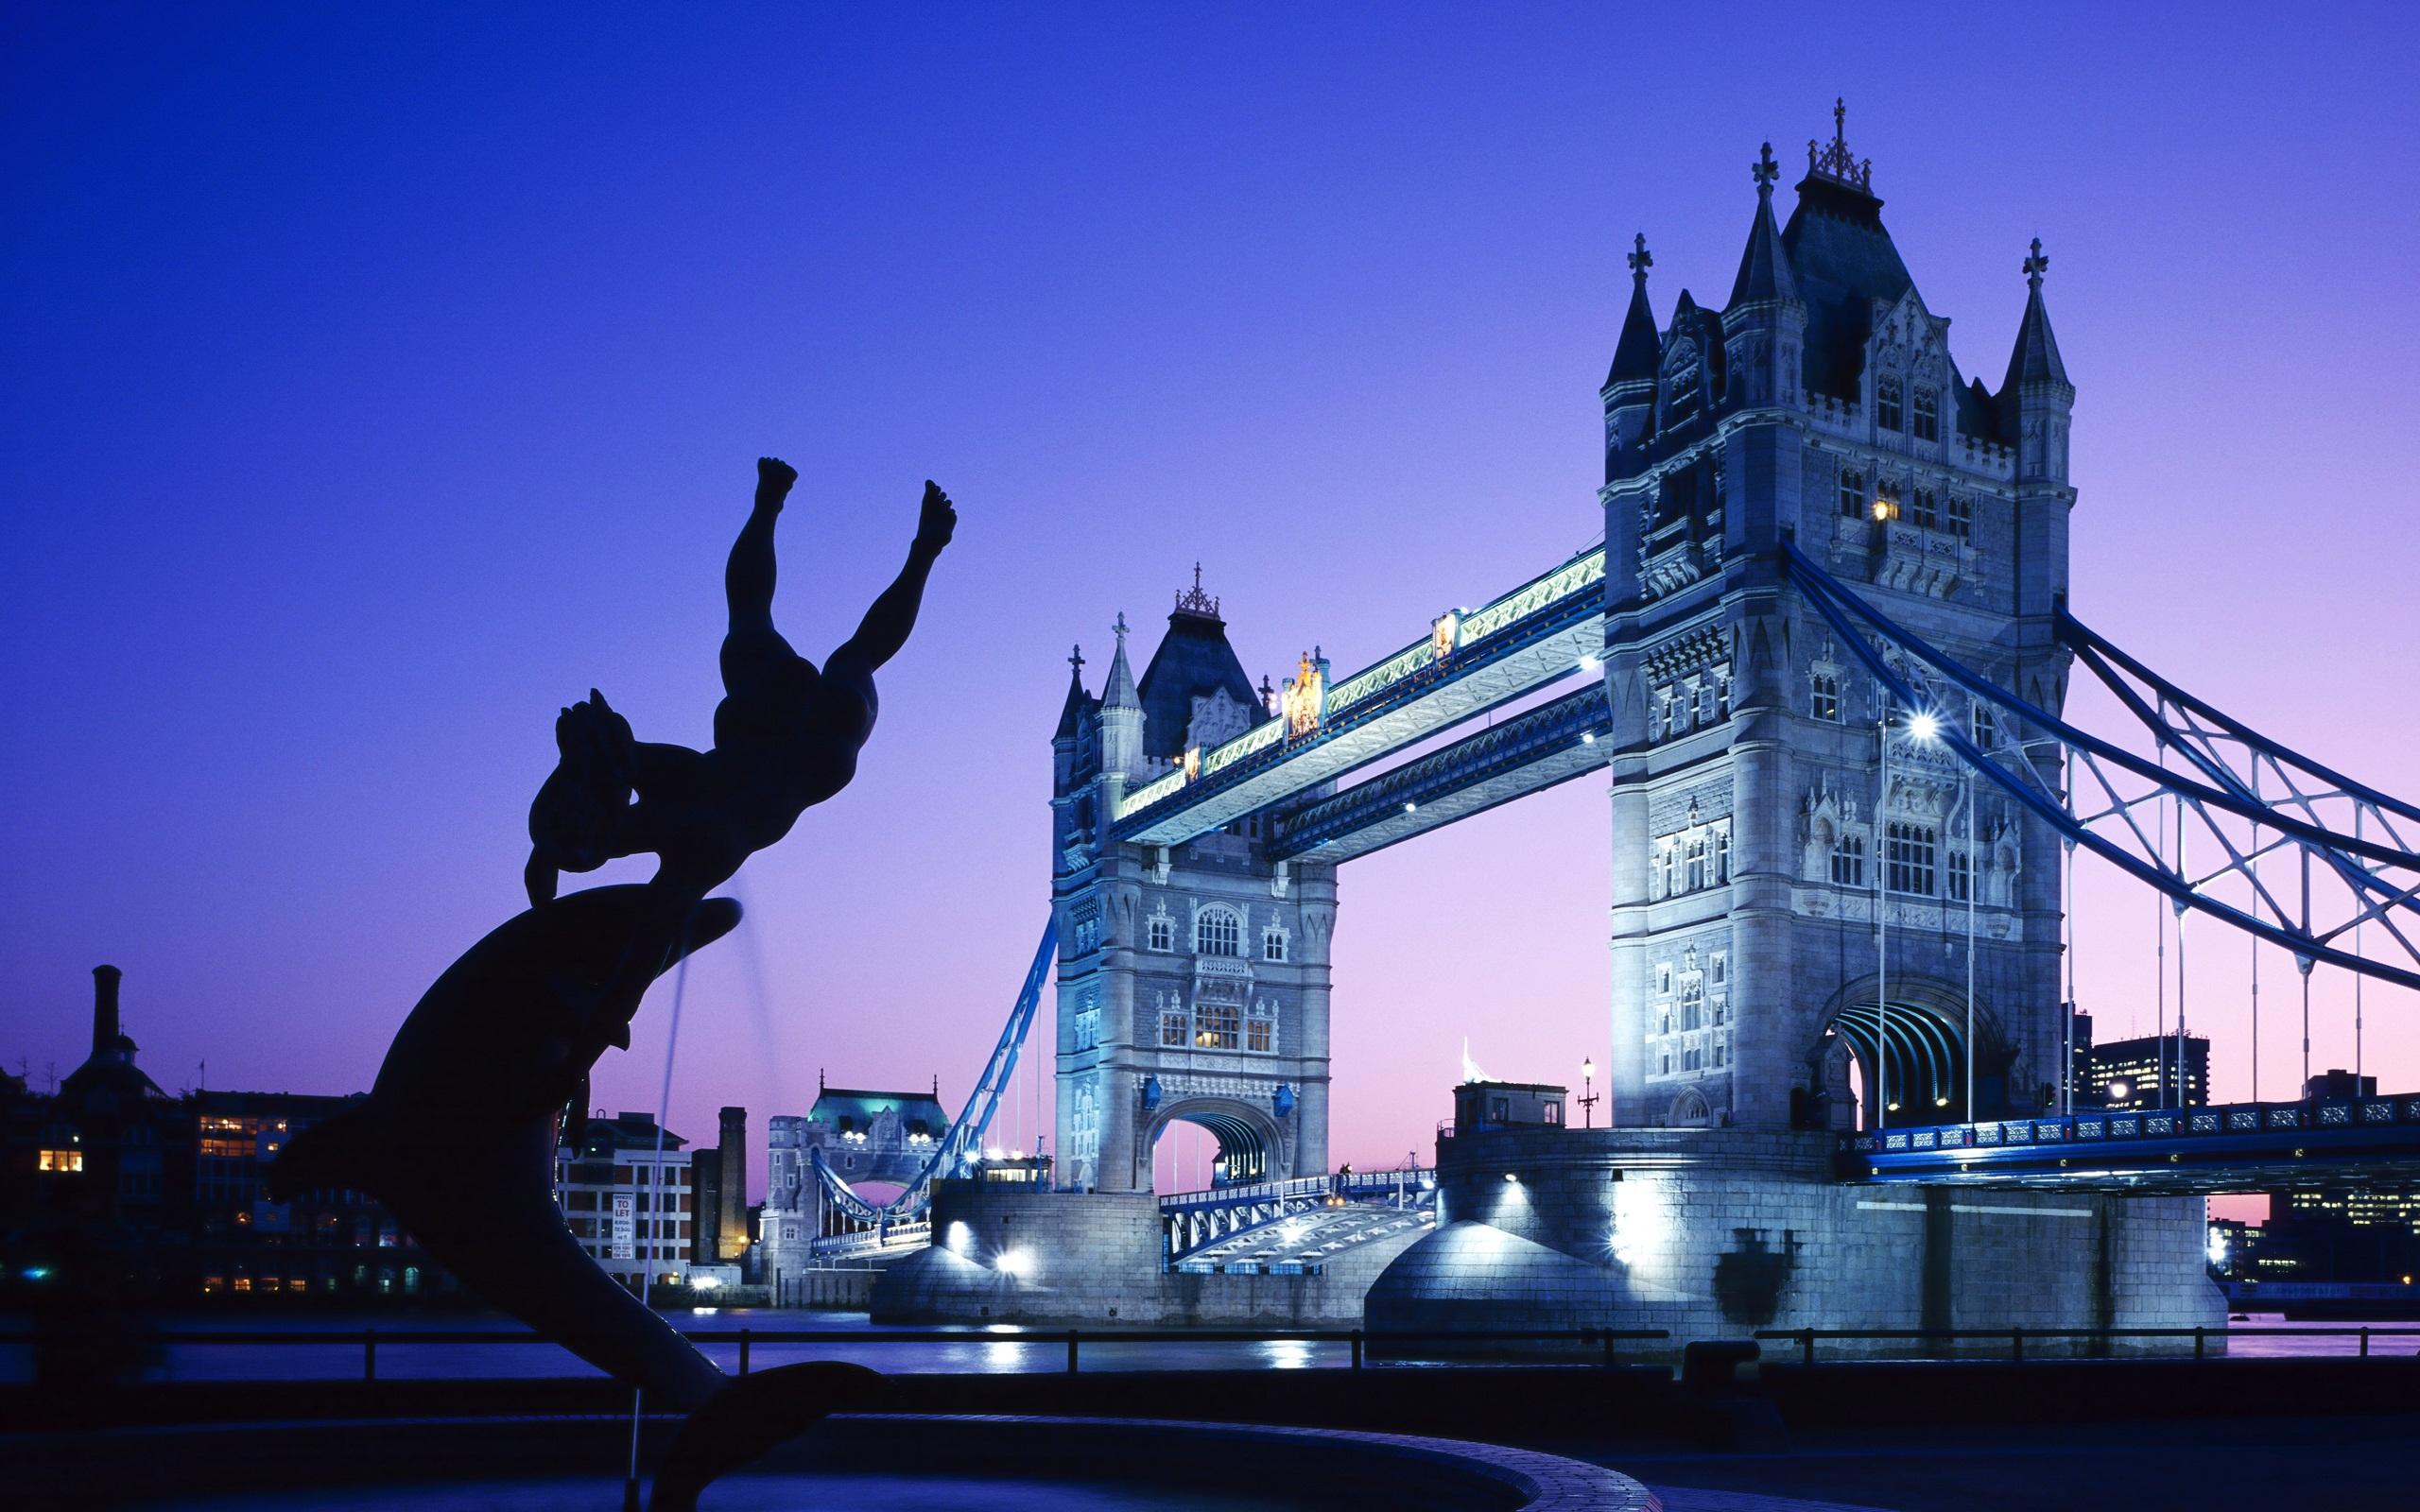 London Tower Bridge UK Wallpapers HD Wallpapers 2560x1600